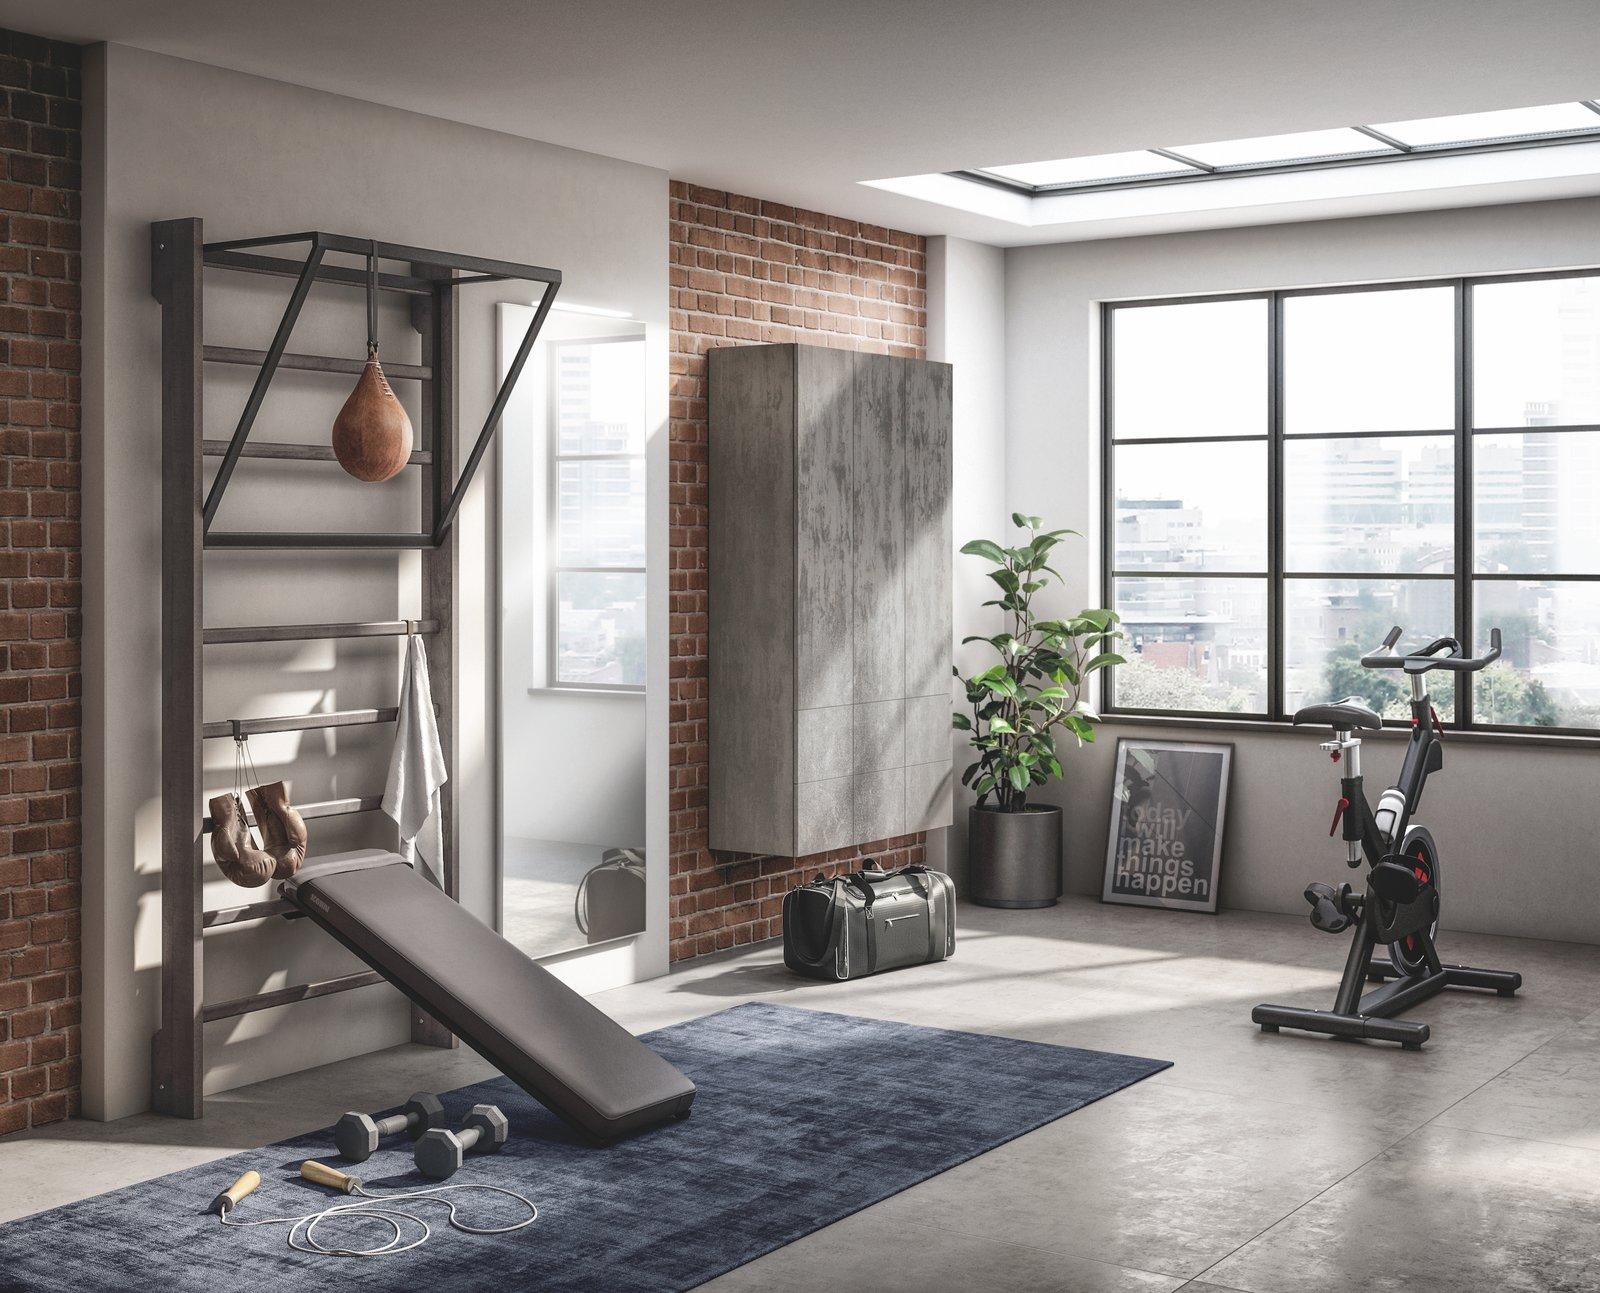 Gym Space by Scavolini and Mattia Pareschi